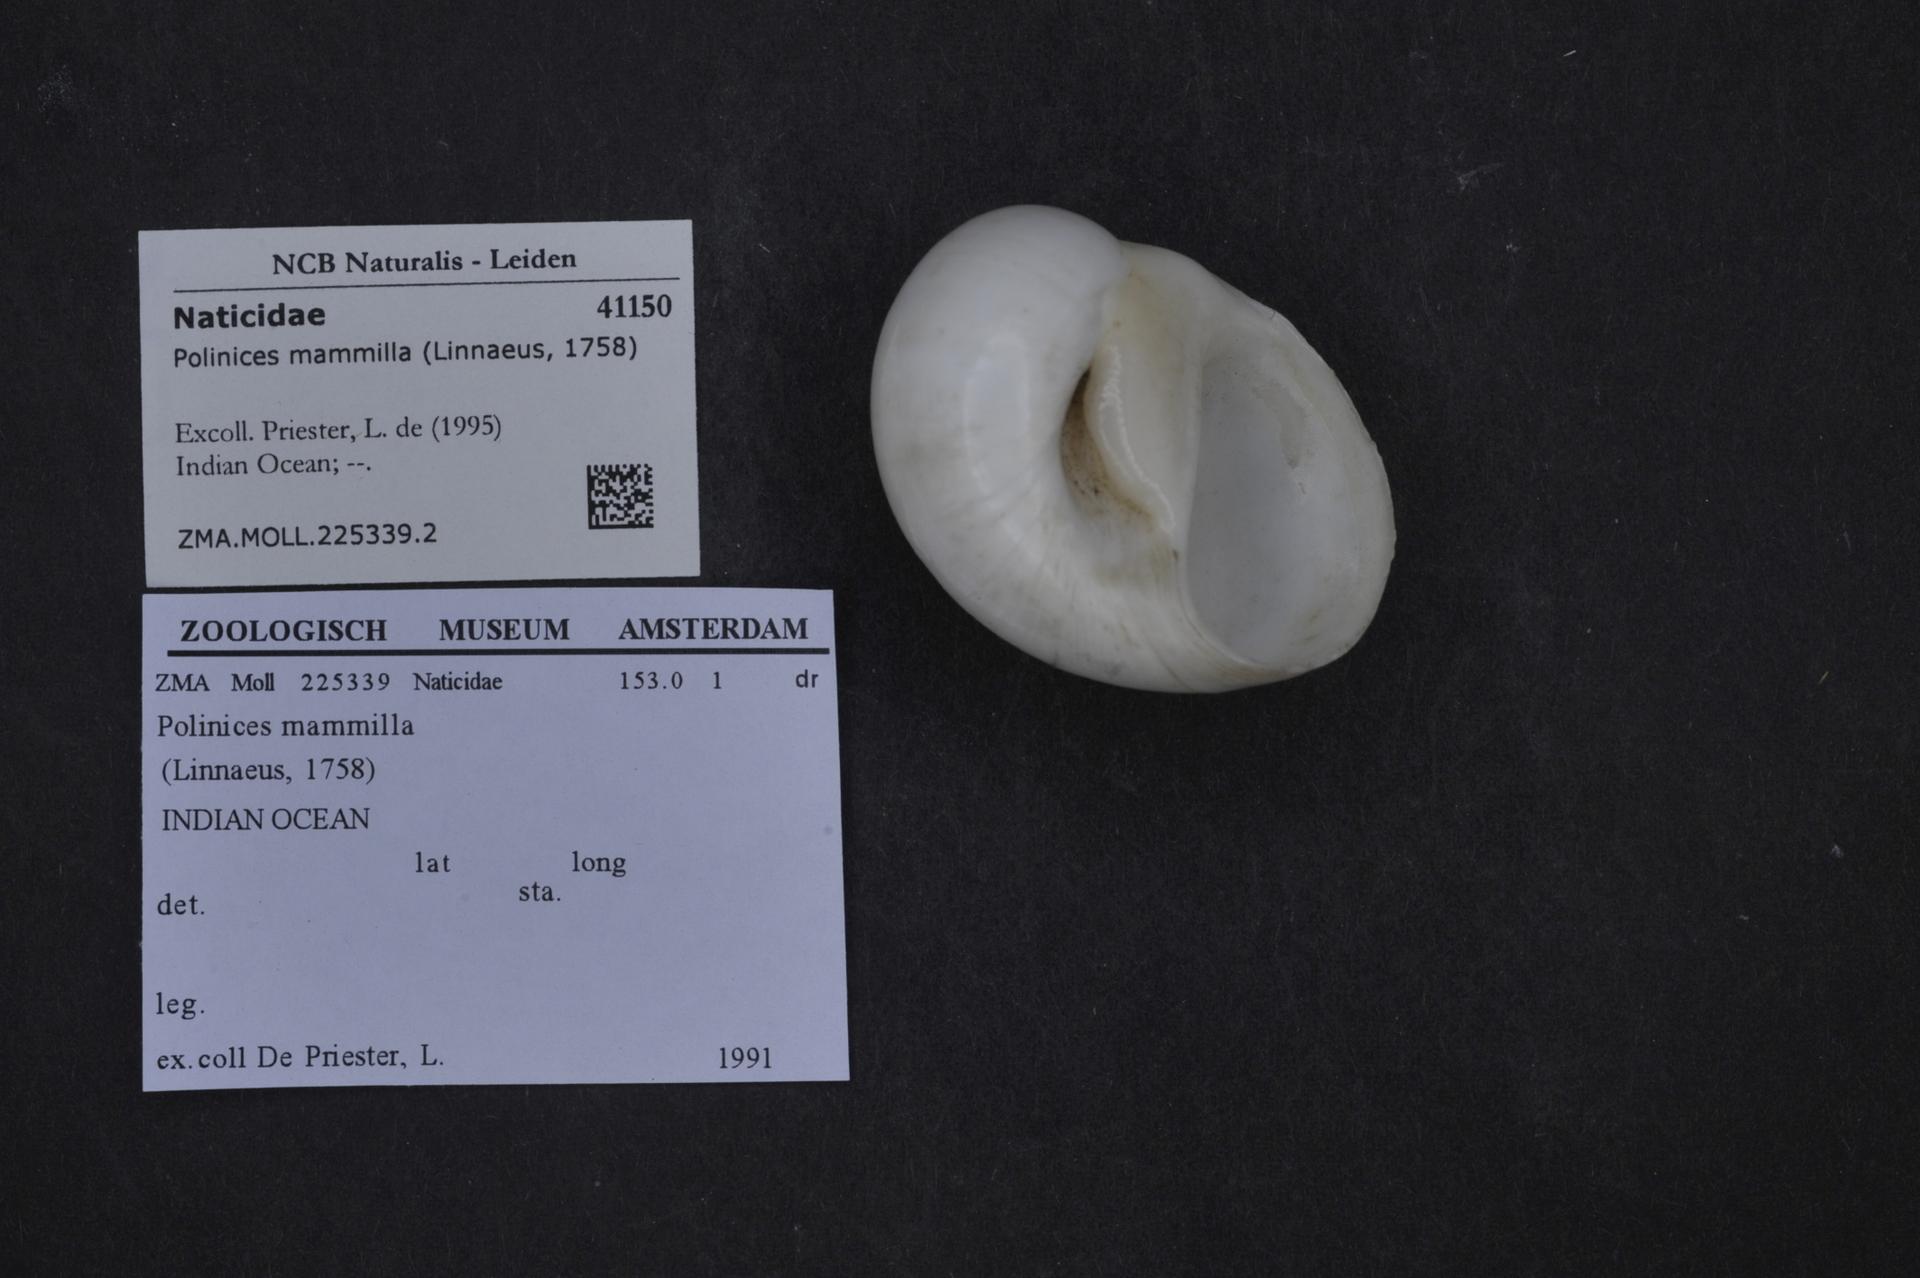 ZMA.MOLL.225339.2 | Polinices mammilla (Linnaeus, 1758)